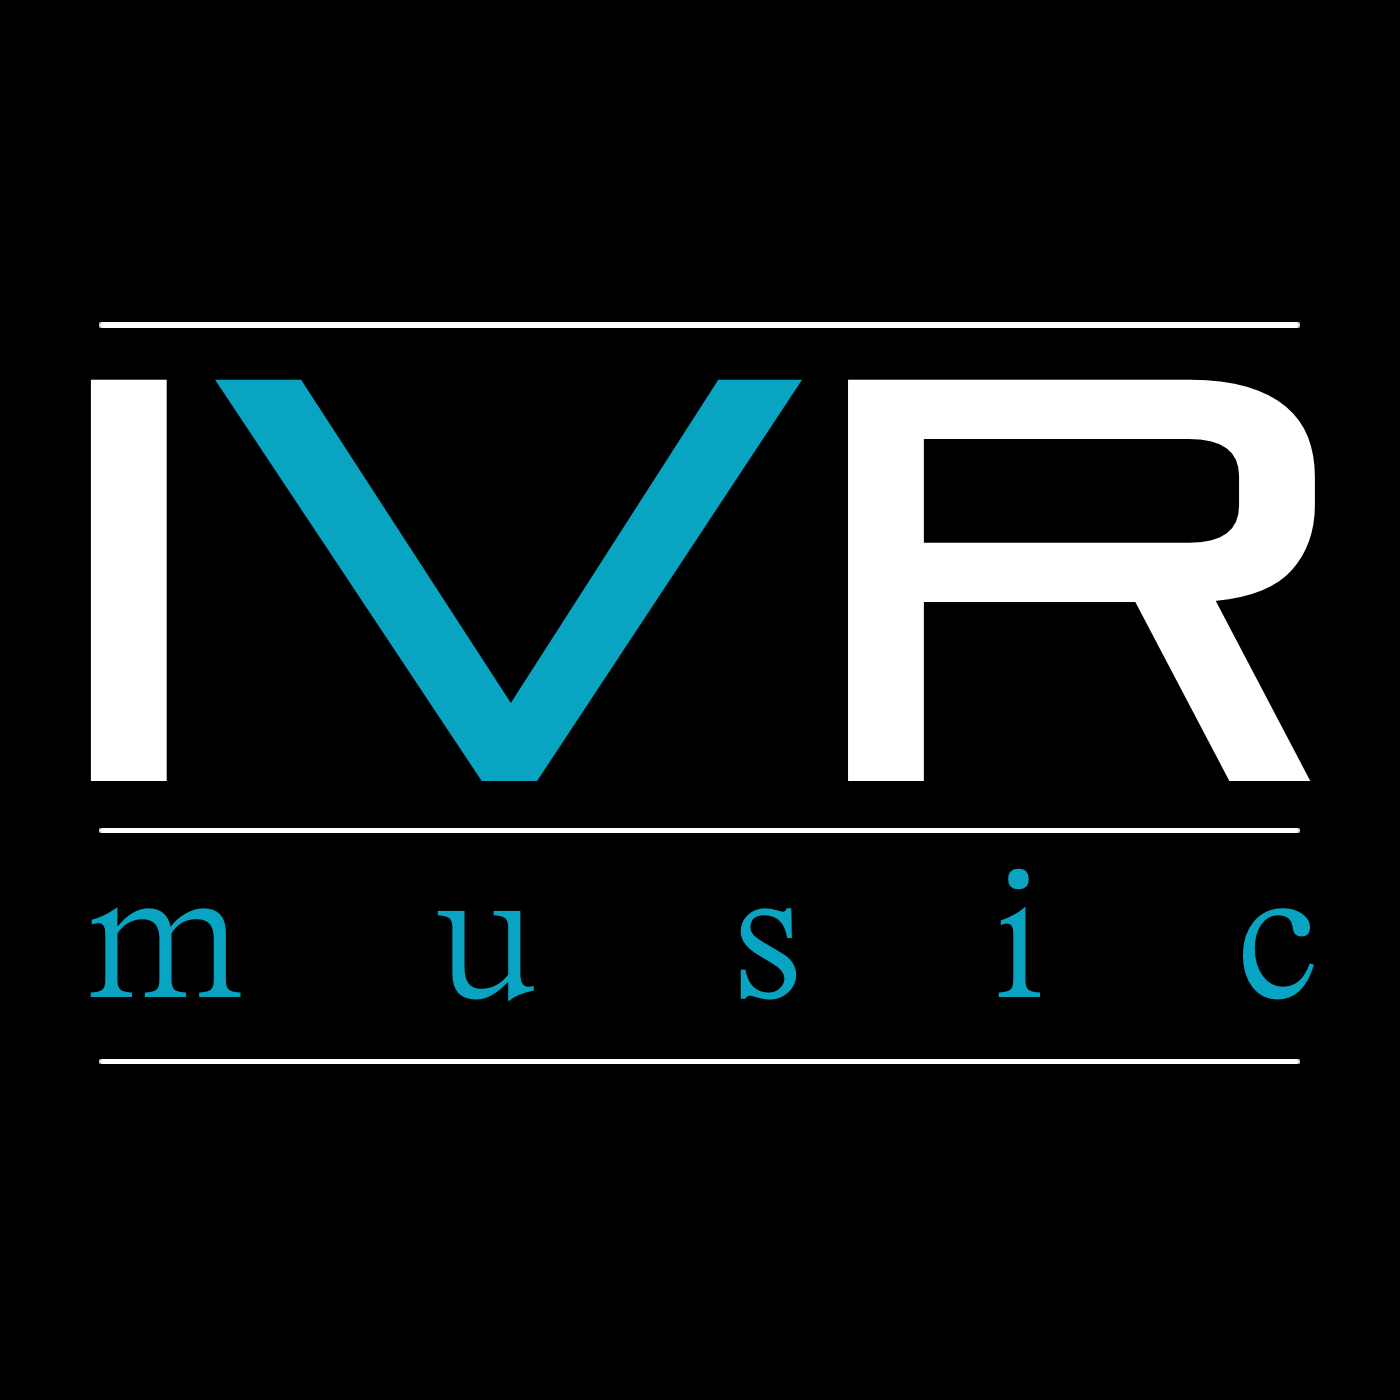 Innervisionsradioivrmusic